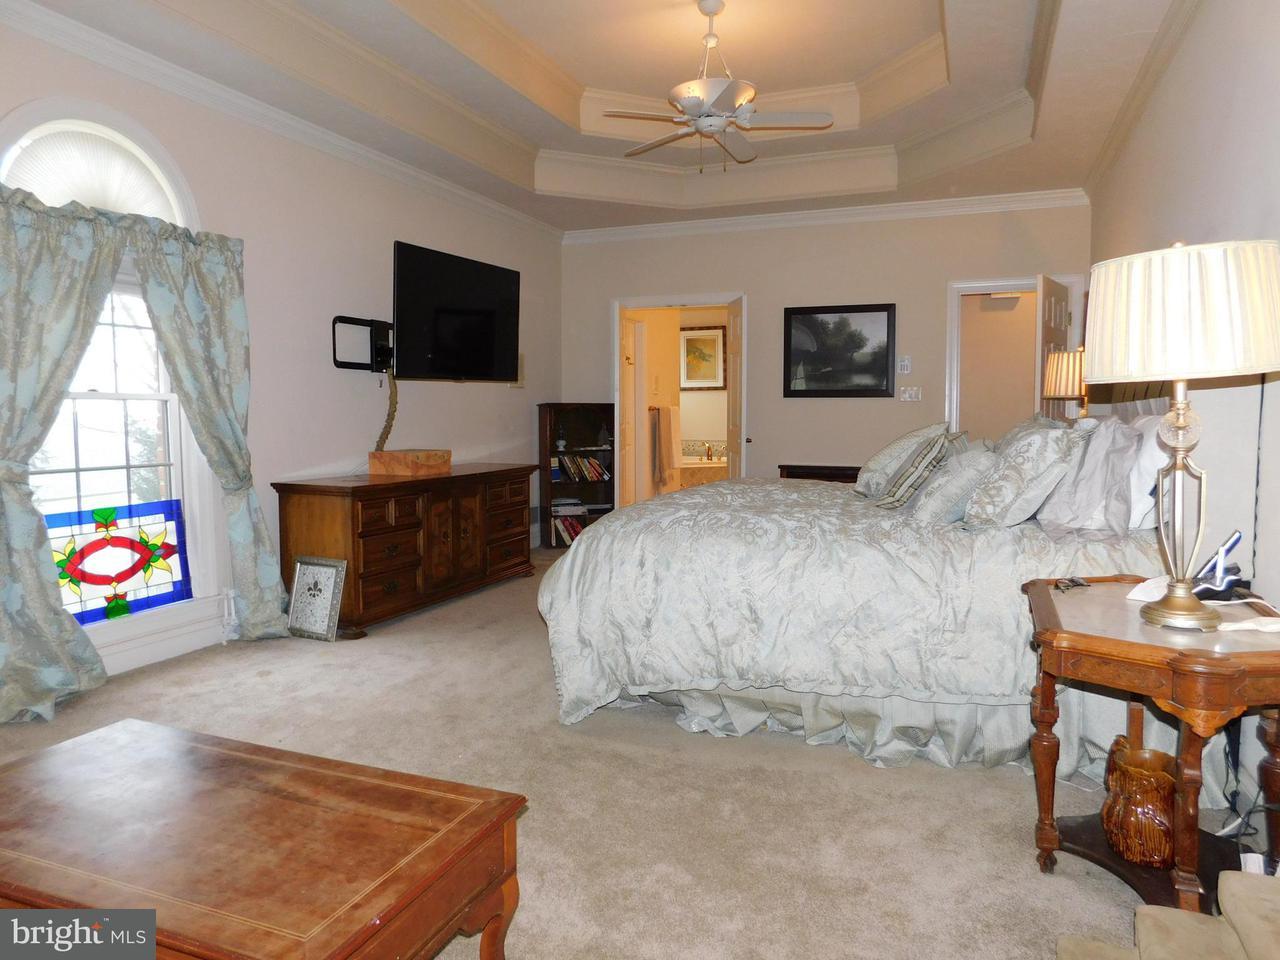 Additional photo for property listing at 11305 Weatherstone Drive 11305 Weatherstone Drive Waynesboro, Pennsylvania 17268 Verenigde Staten